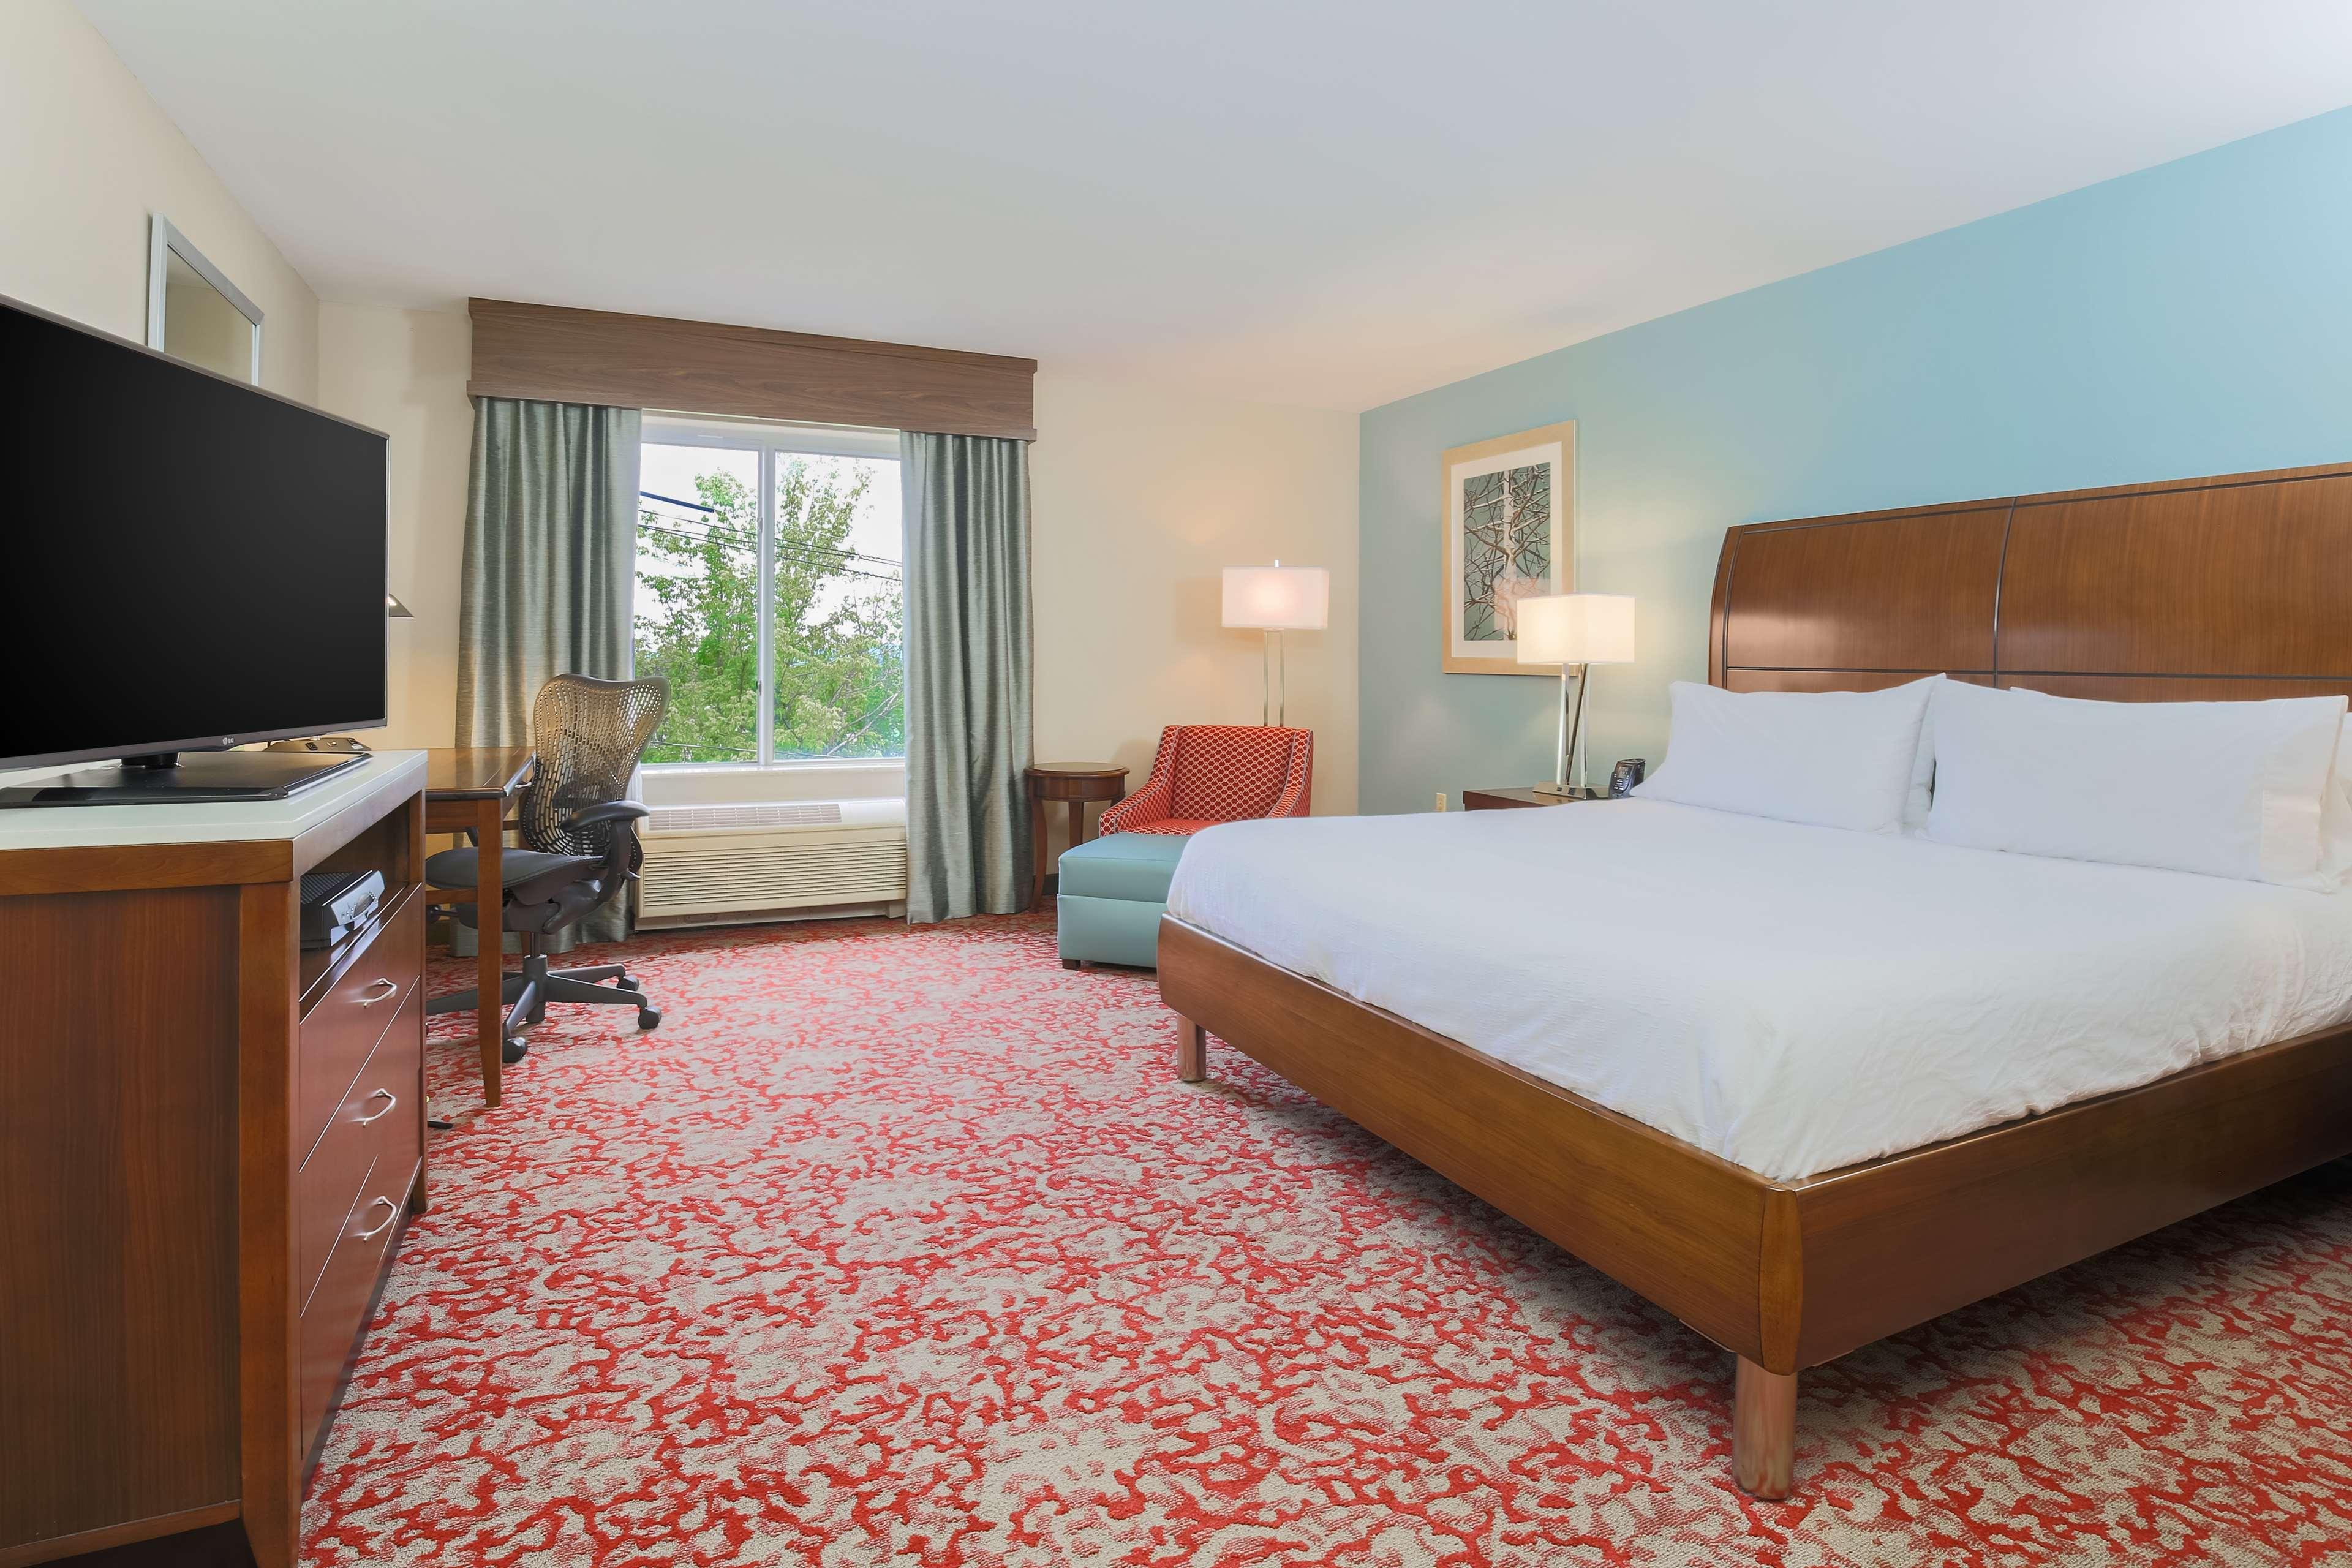 Hilton Garden Inn Nanuet image 21